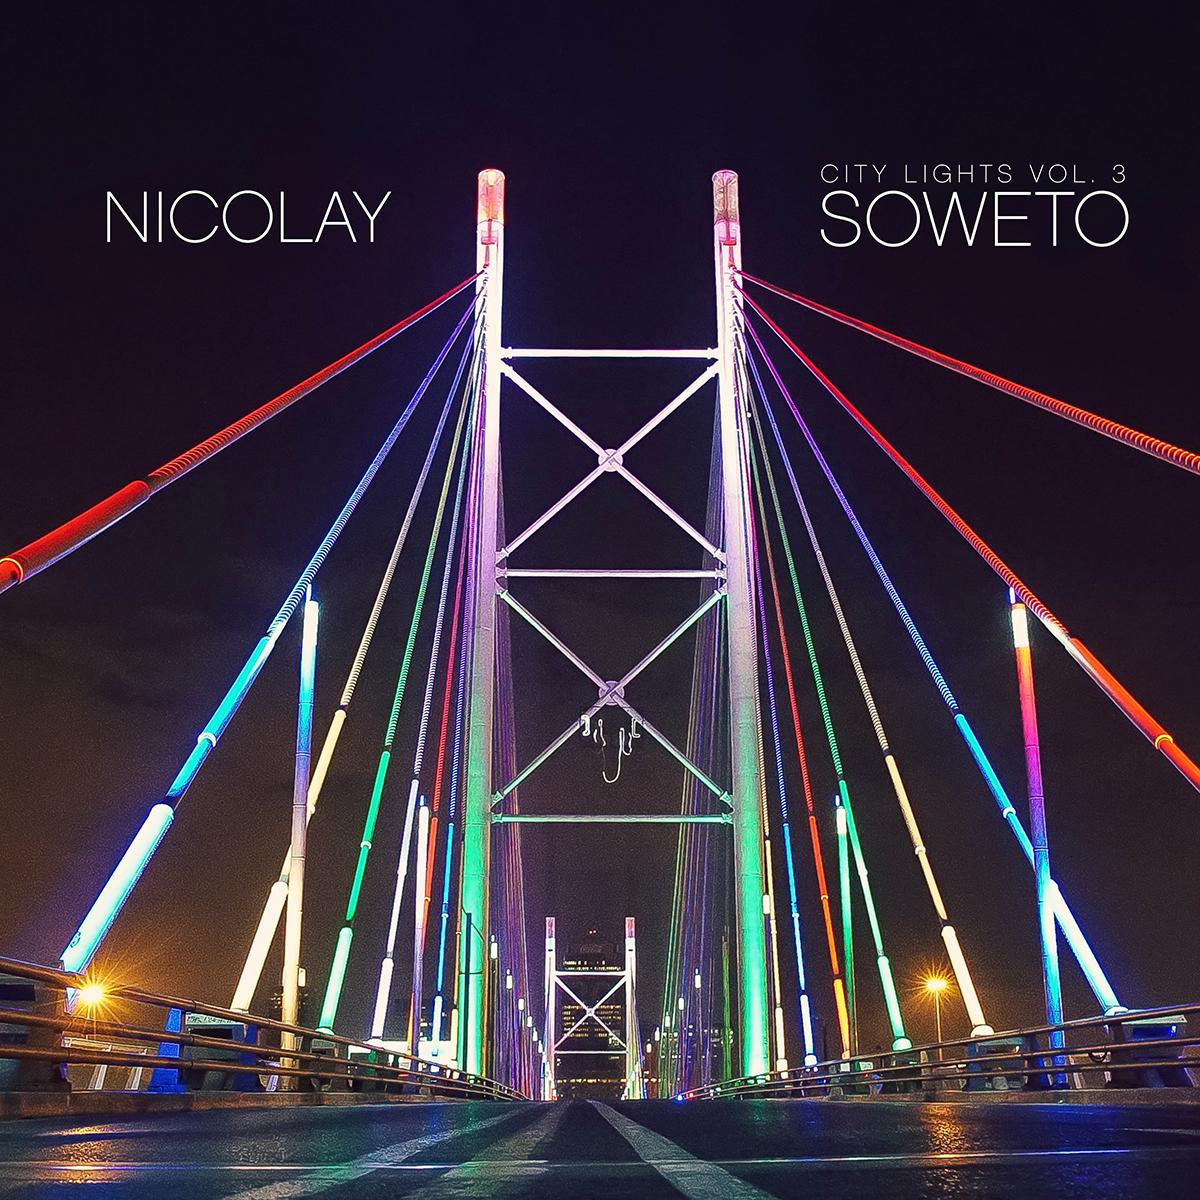 5. Nicolay - City Lights Vol. 3: Soweto